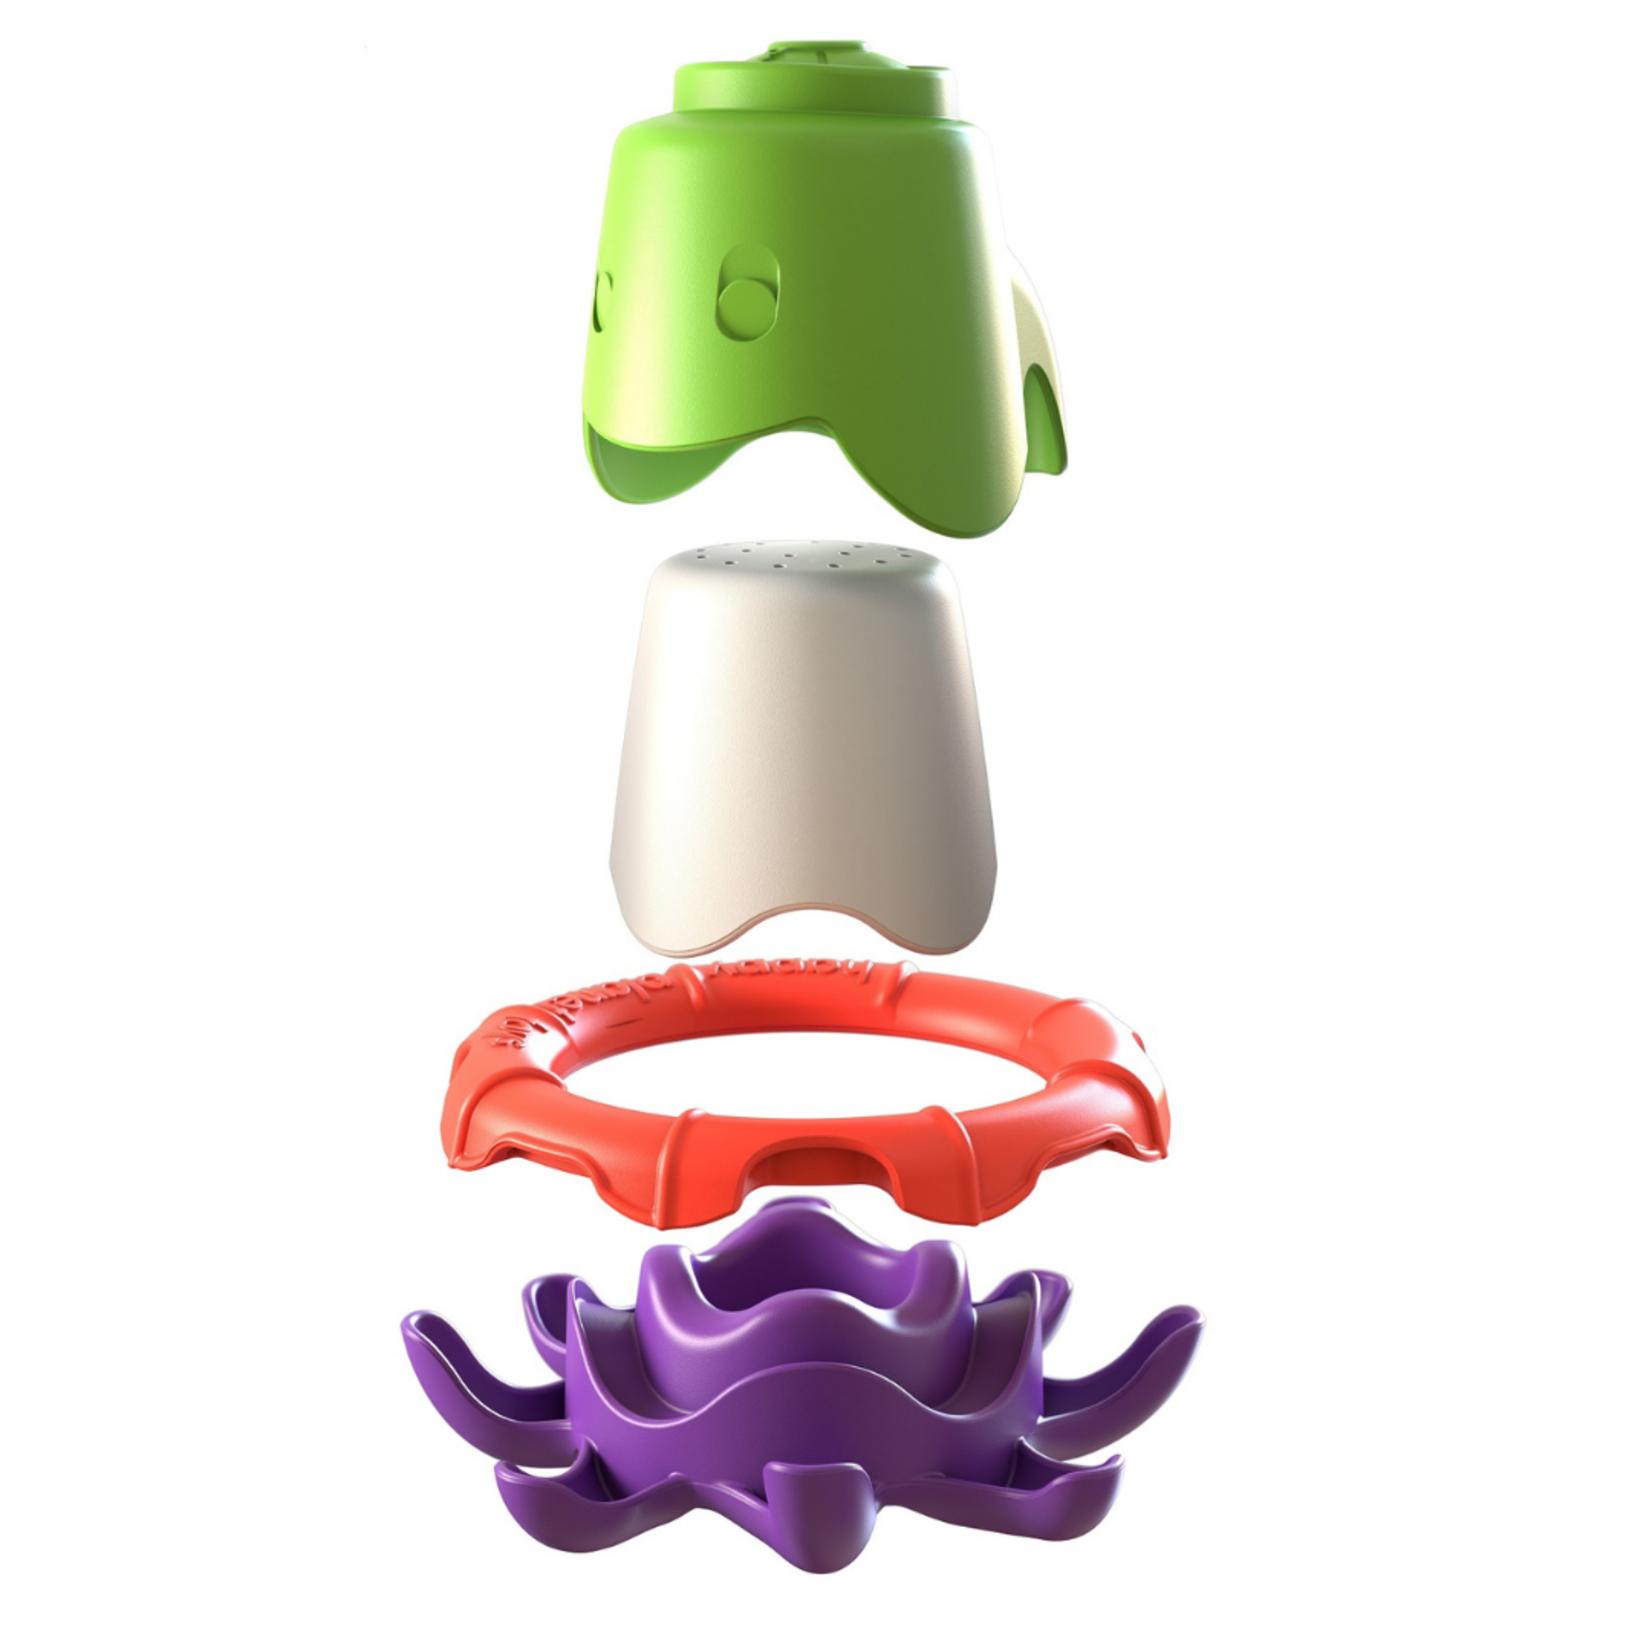 Happy Planet Toys Happy Planet Toys - Octo Buoy